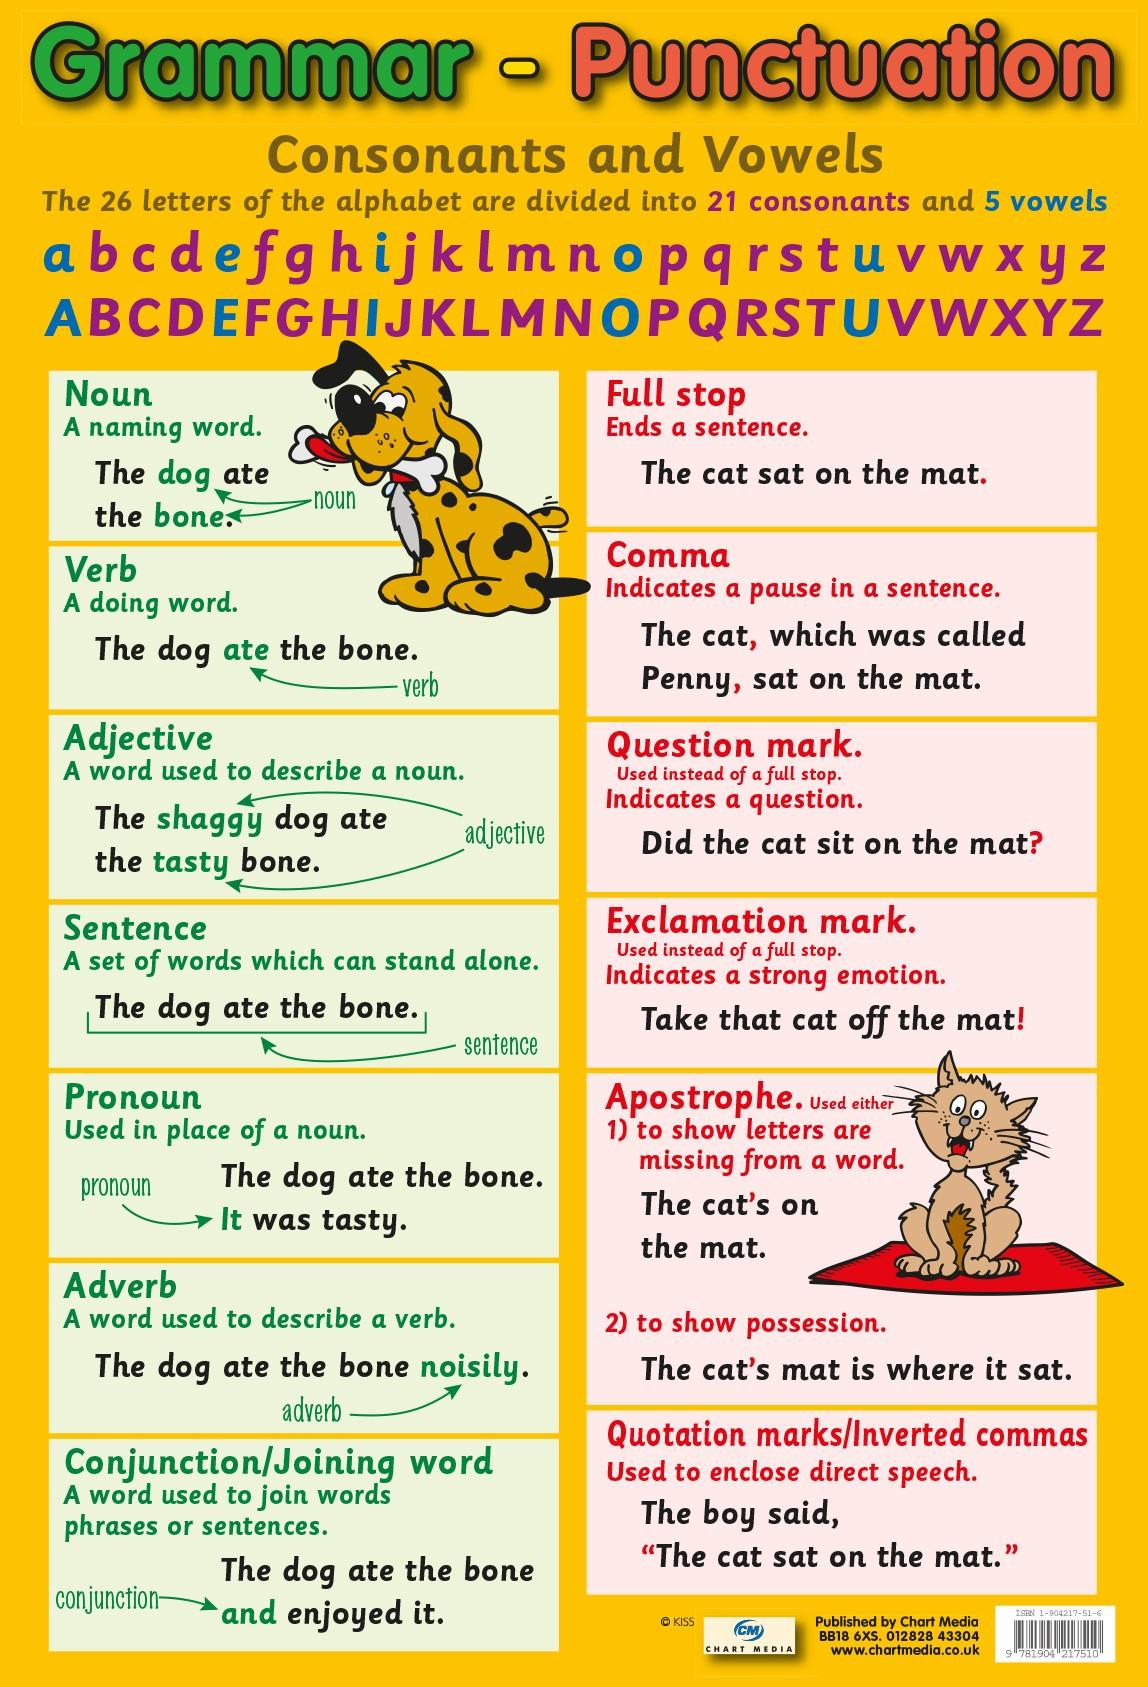 Grammar Amp Punctuation Poster Chart Media